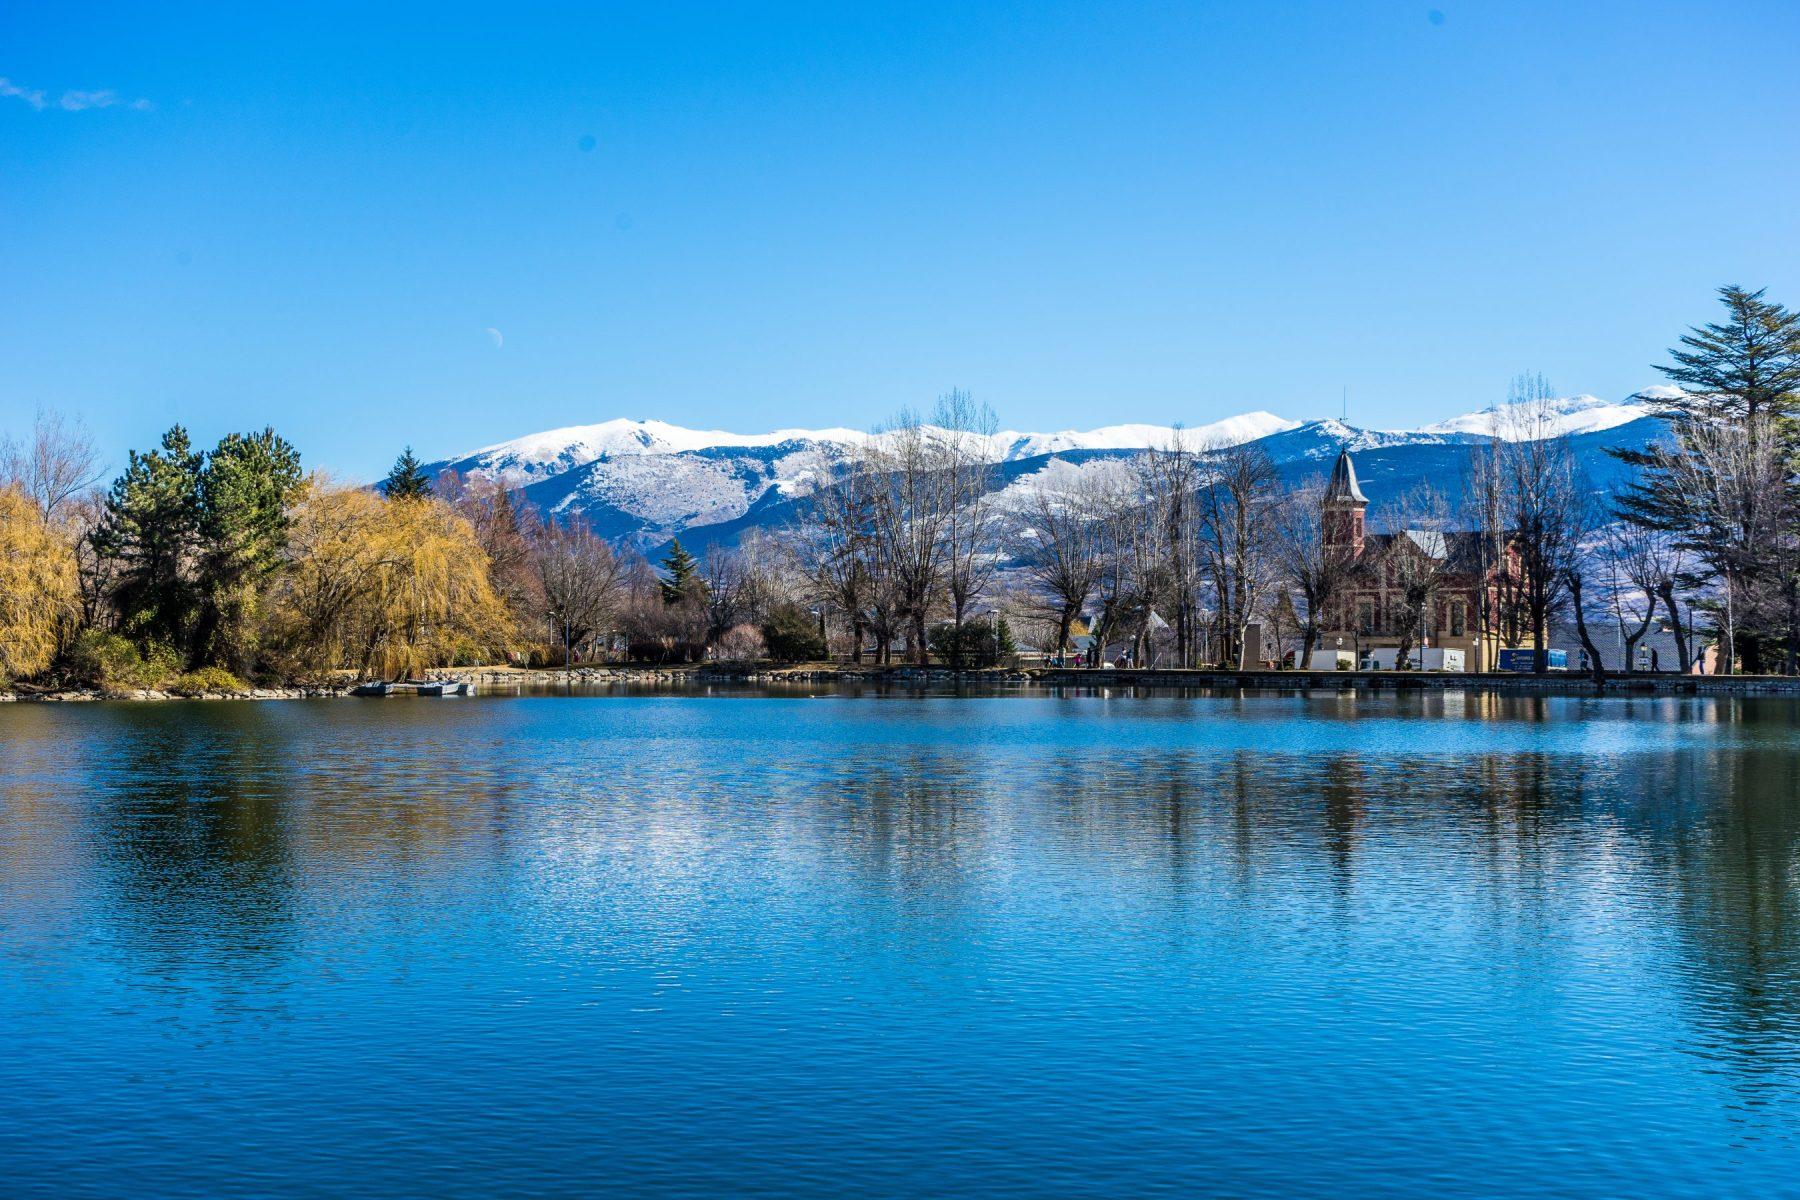 L'estany de Puigcerdà